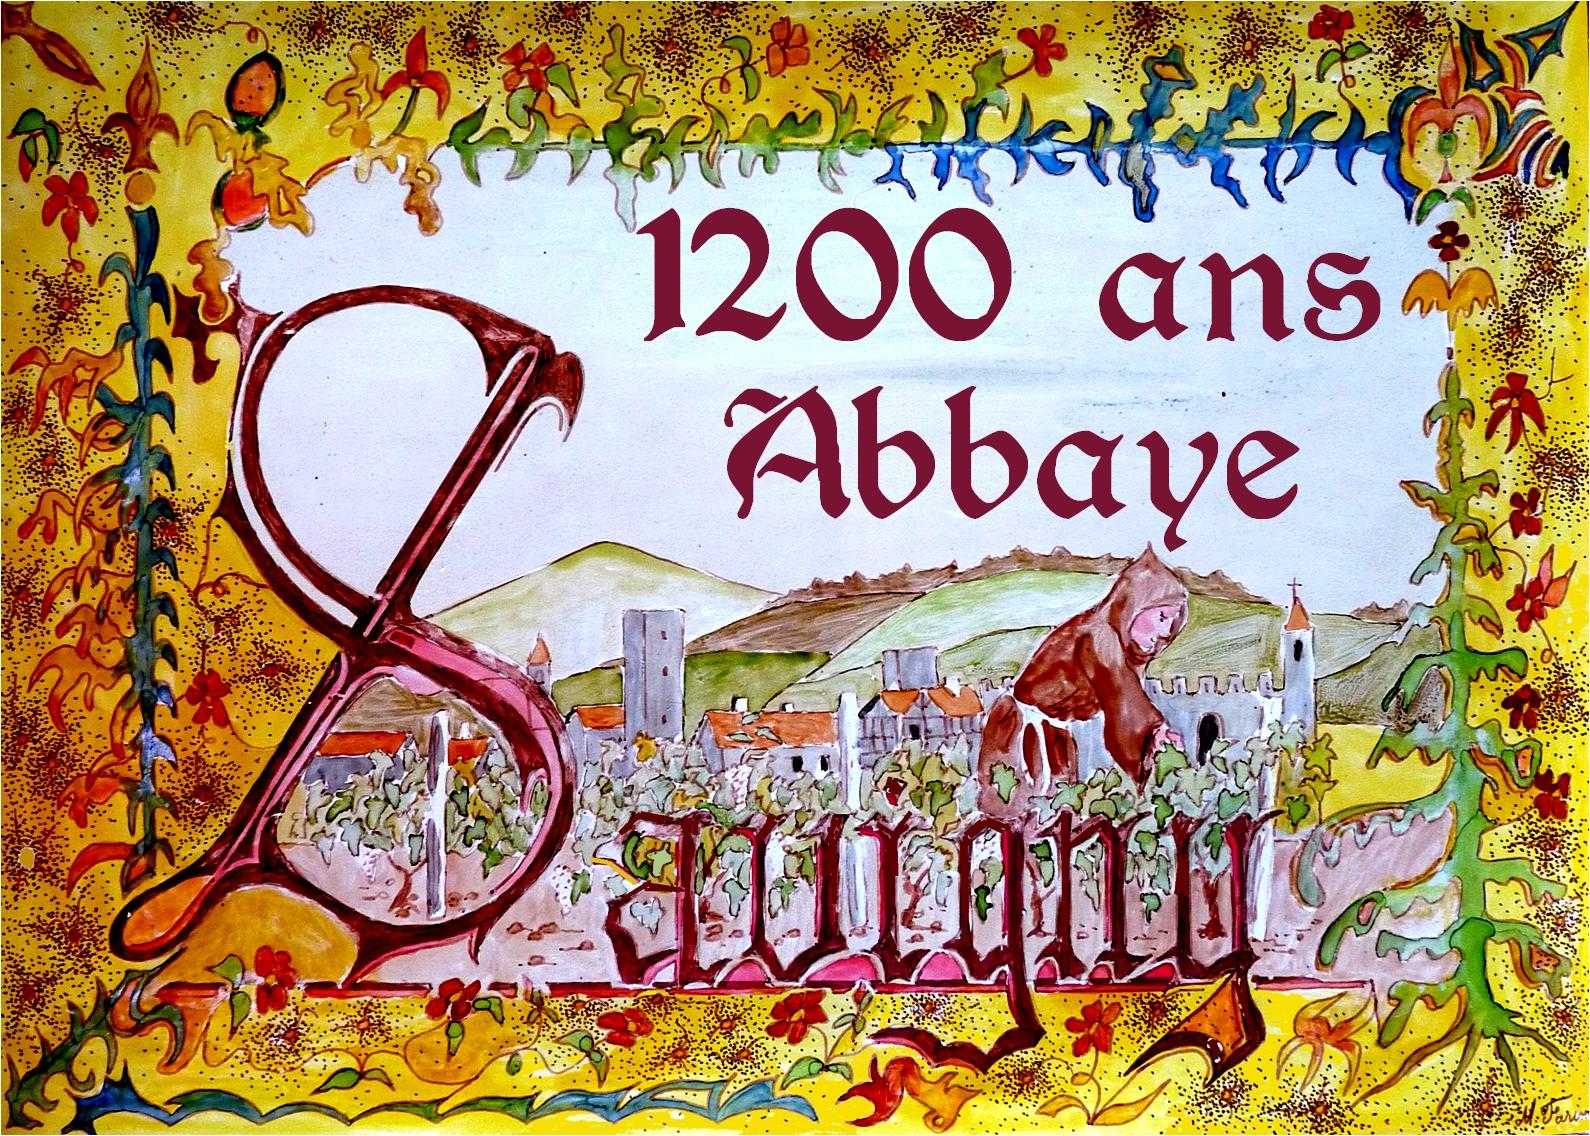 1200 ans abbaye de savigny savigny 69210 sur fetes. Black Bedroom Furniture Sets. Home Design Ideas